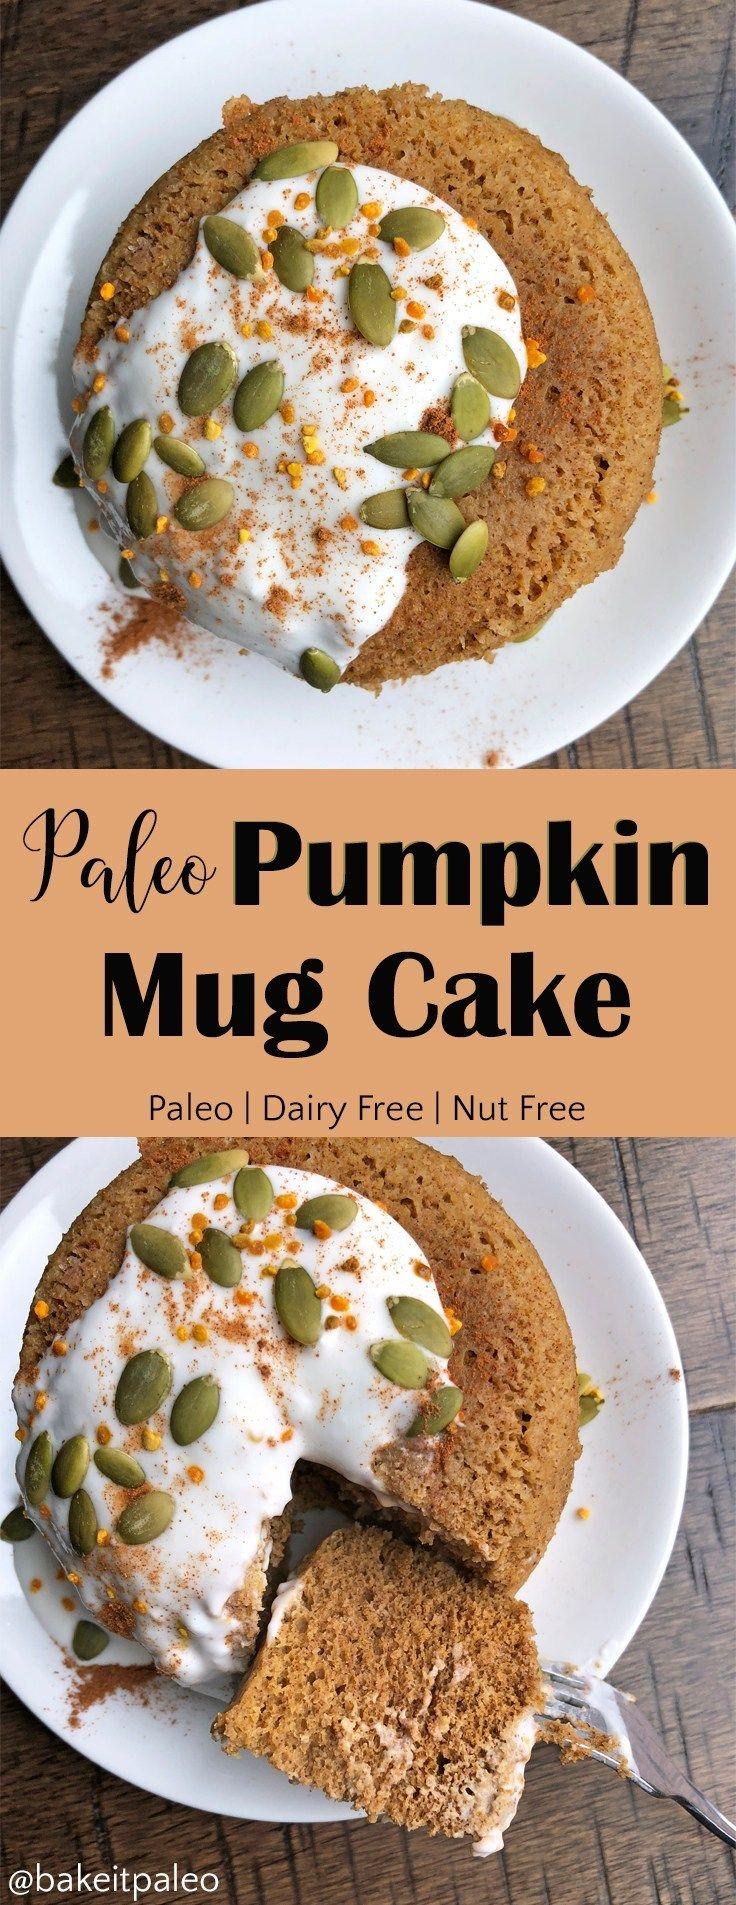 Paleo Pumpkin Protein Mug Cake  #dairyfree #pumpkin #mugcake #microwavecake #nutfree #paleocake #paleotreat #mugcake